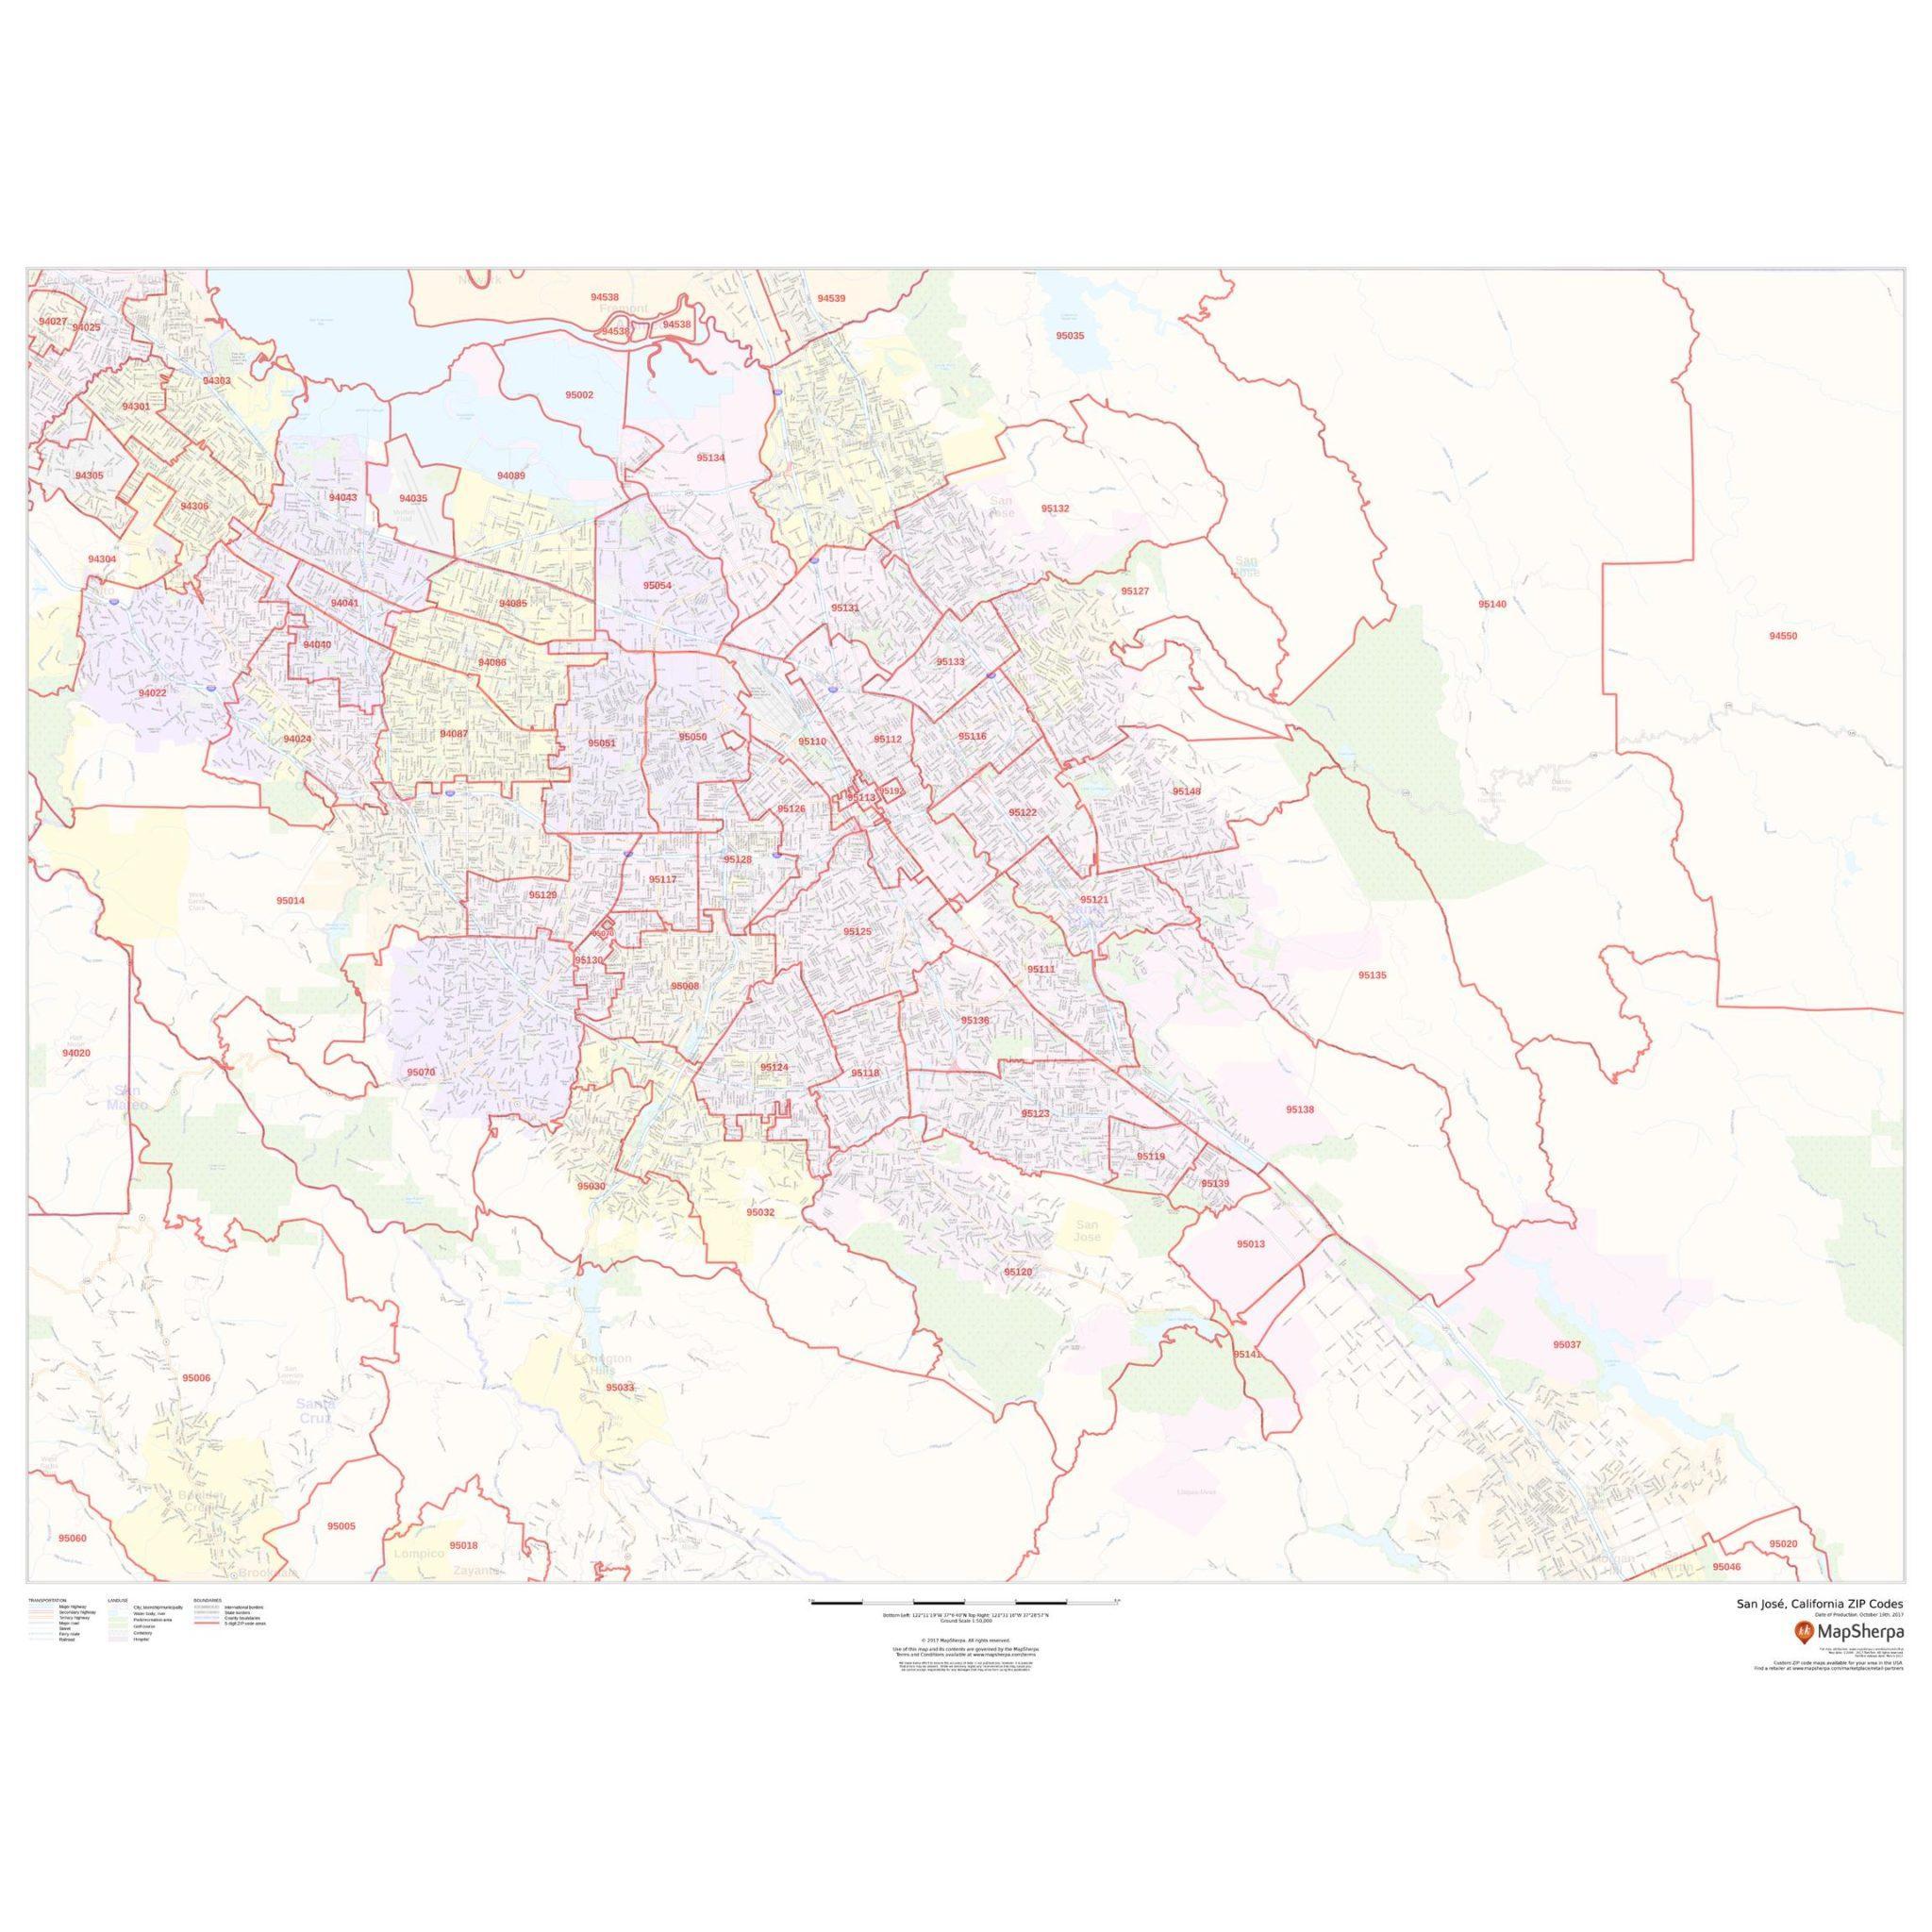 San Jose, California Zip Codes - The Map Shop - California Zip Code Map